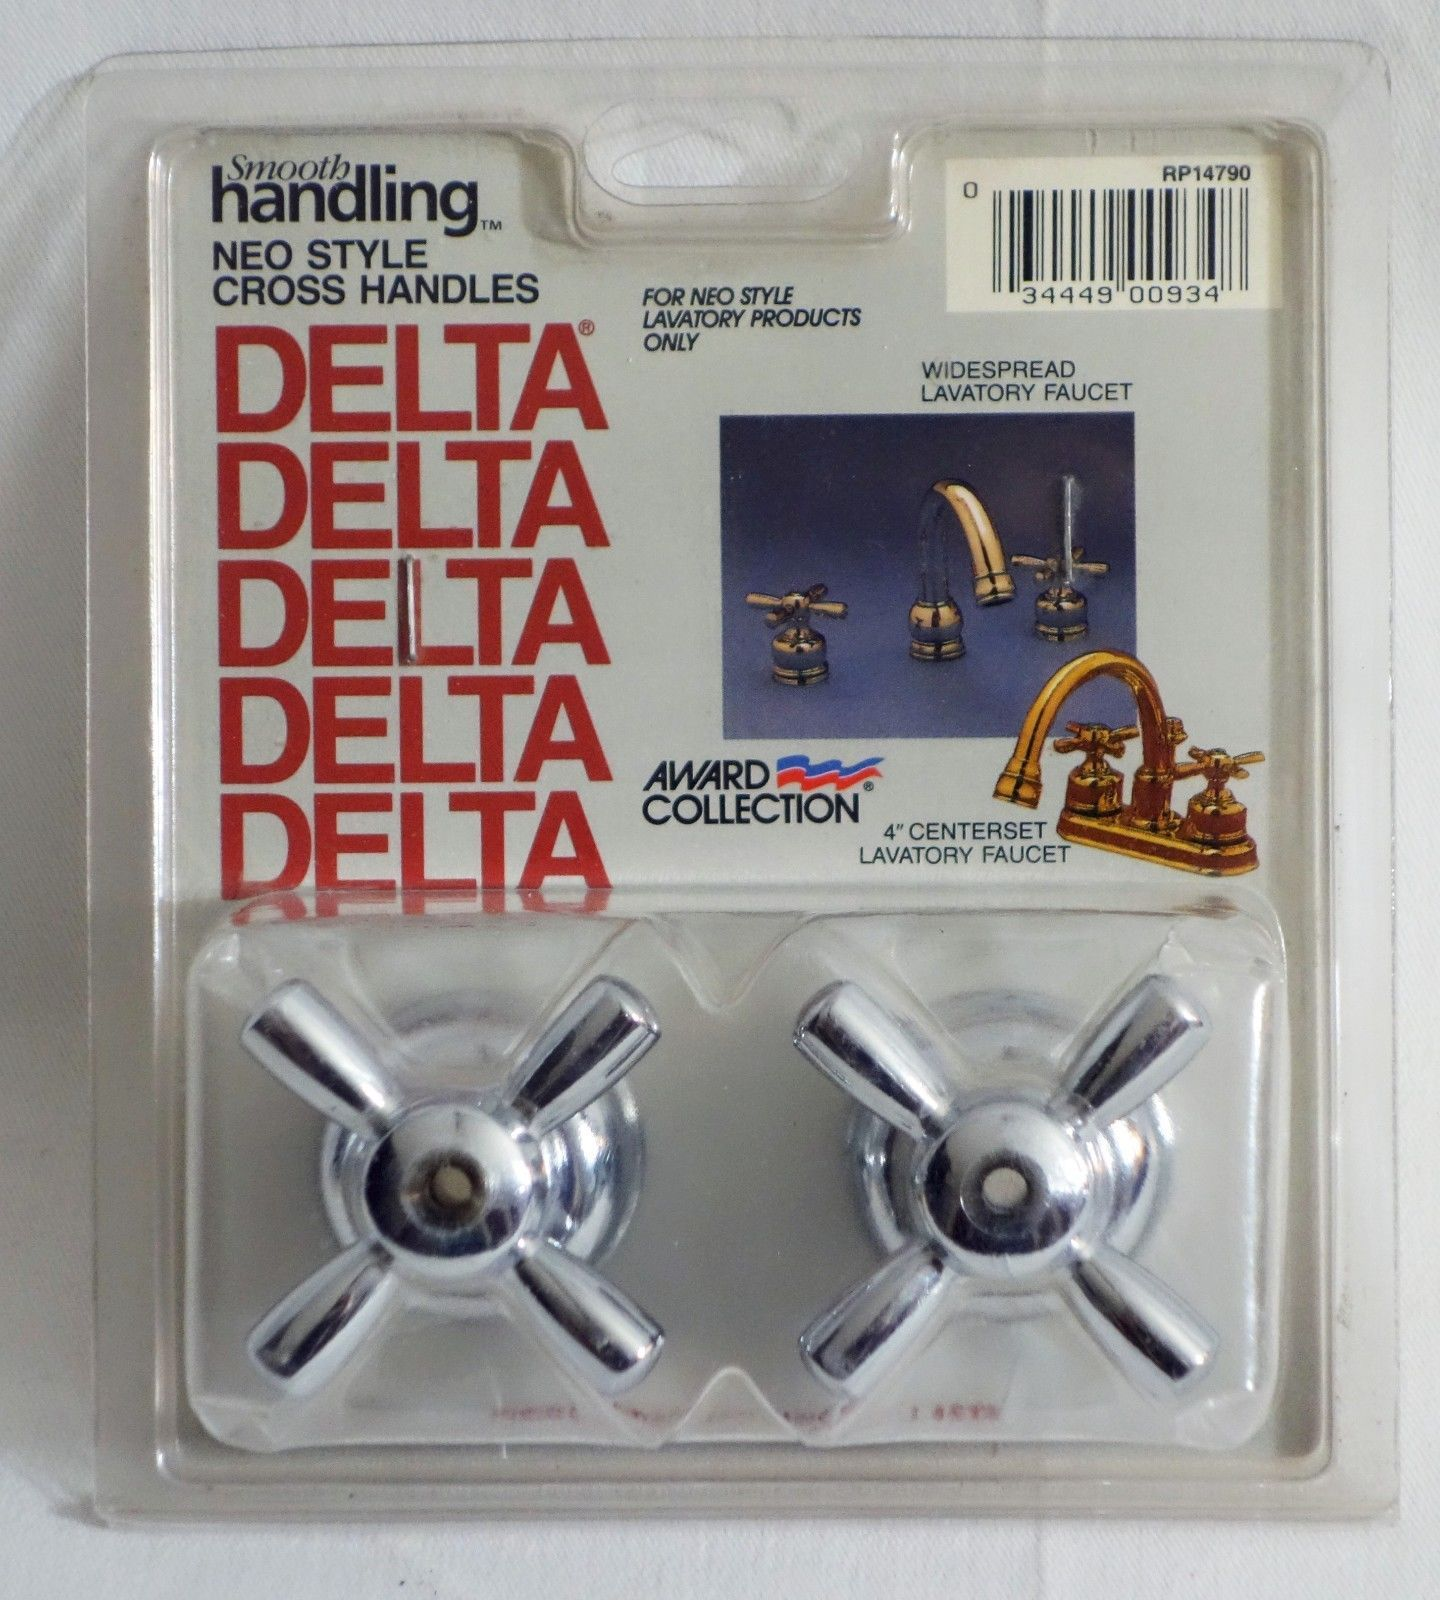 Vintage Delta Smooth Handling Neo Style Cross Handles | Plumbing ...